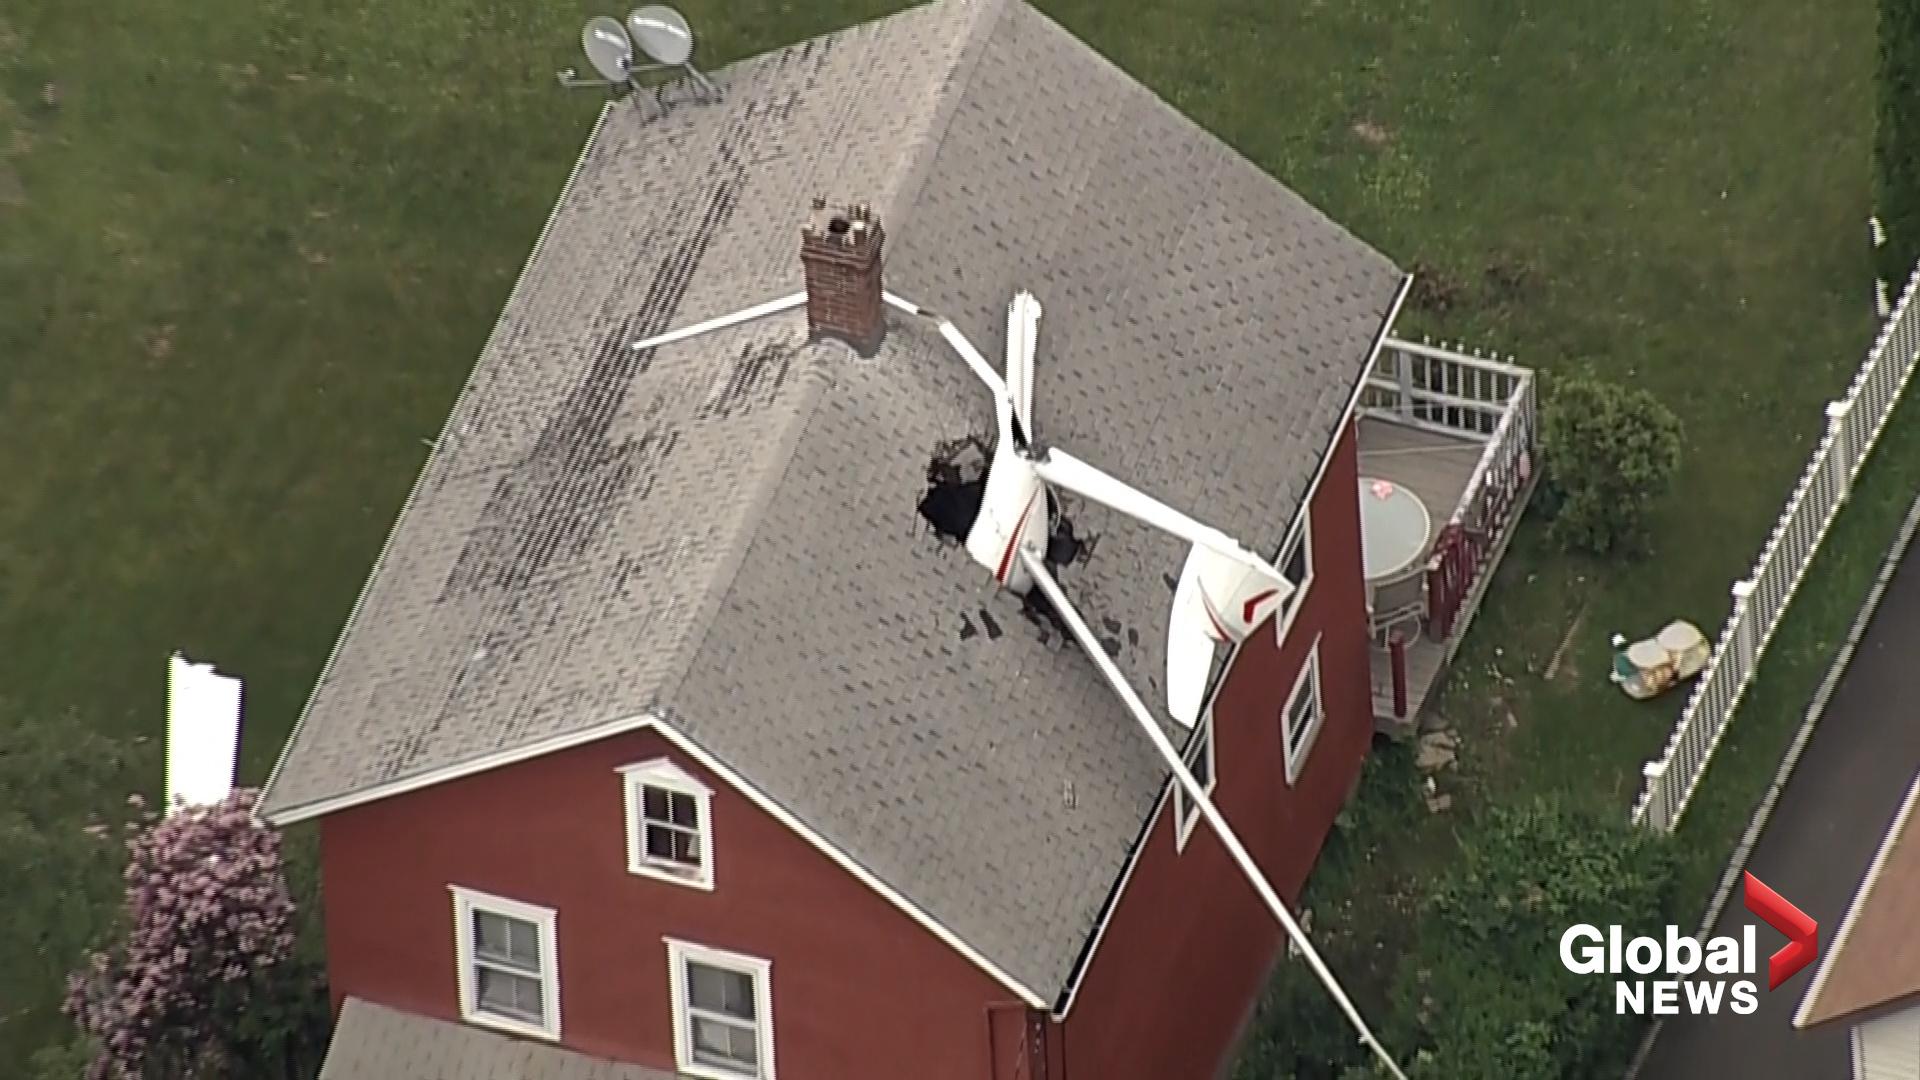 Glider plane crashes into Danbury home